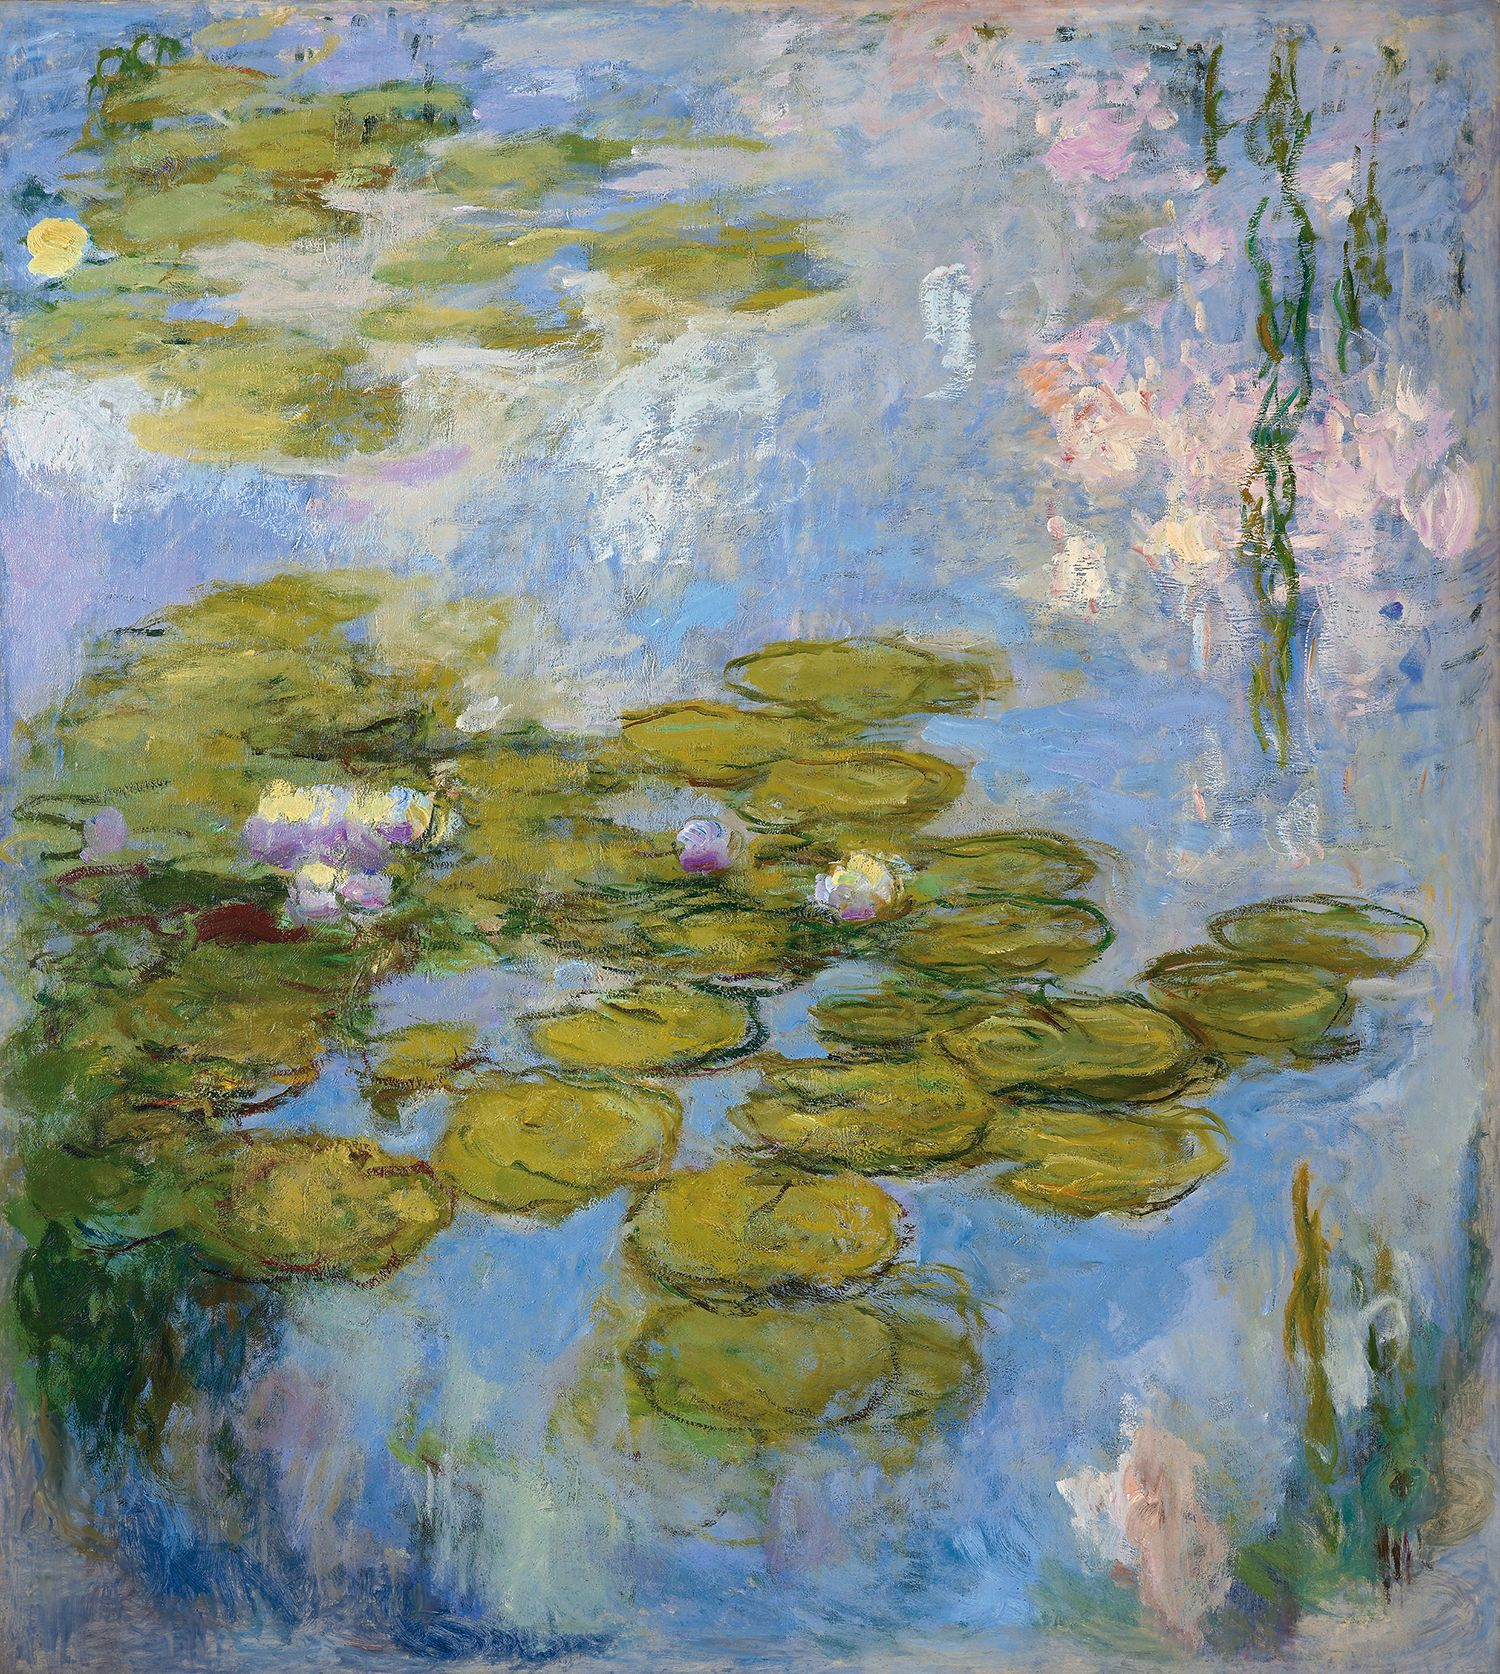 Claude Monet/Seerosen, 1916-1919/Öl auf Leinwand/Fondation Beyeler, Riehen/Basel, Sammlung Beyeler/© Fondation Beyeler, Riehen/Basel, Sammlung Beyeler; Foto: Robert Bayer